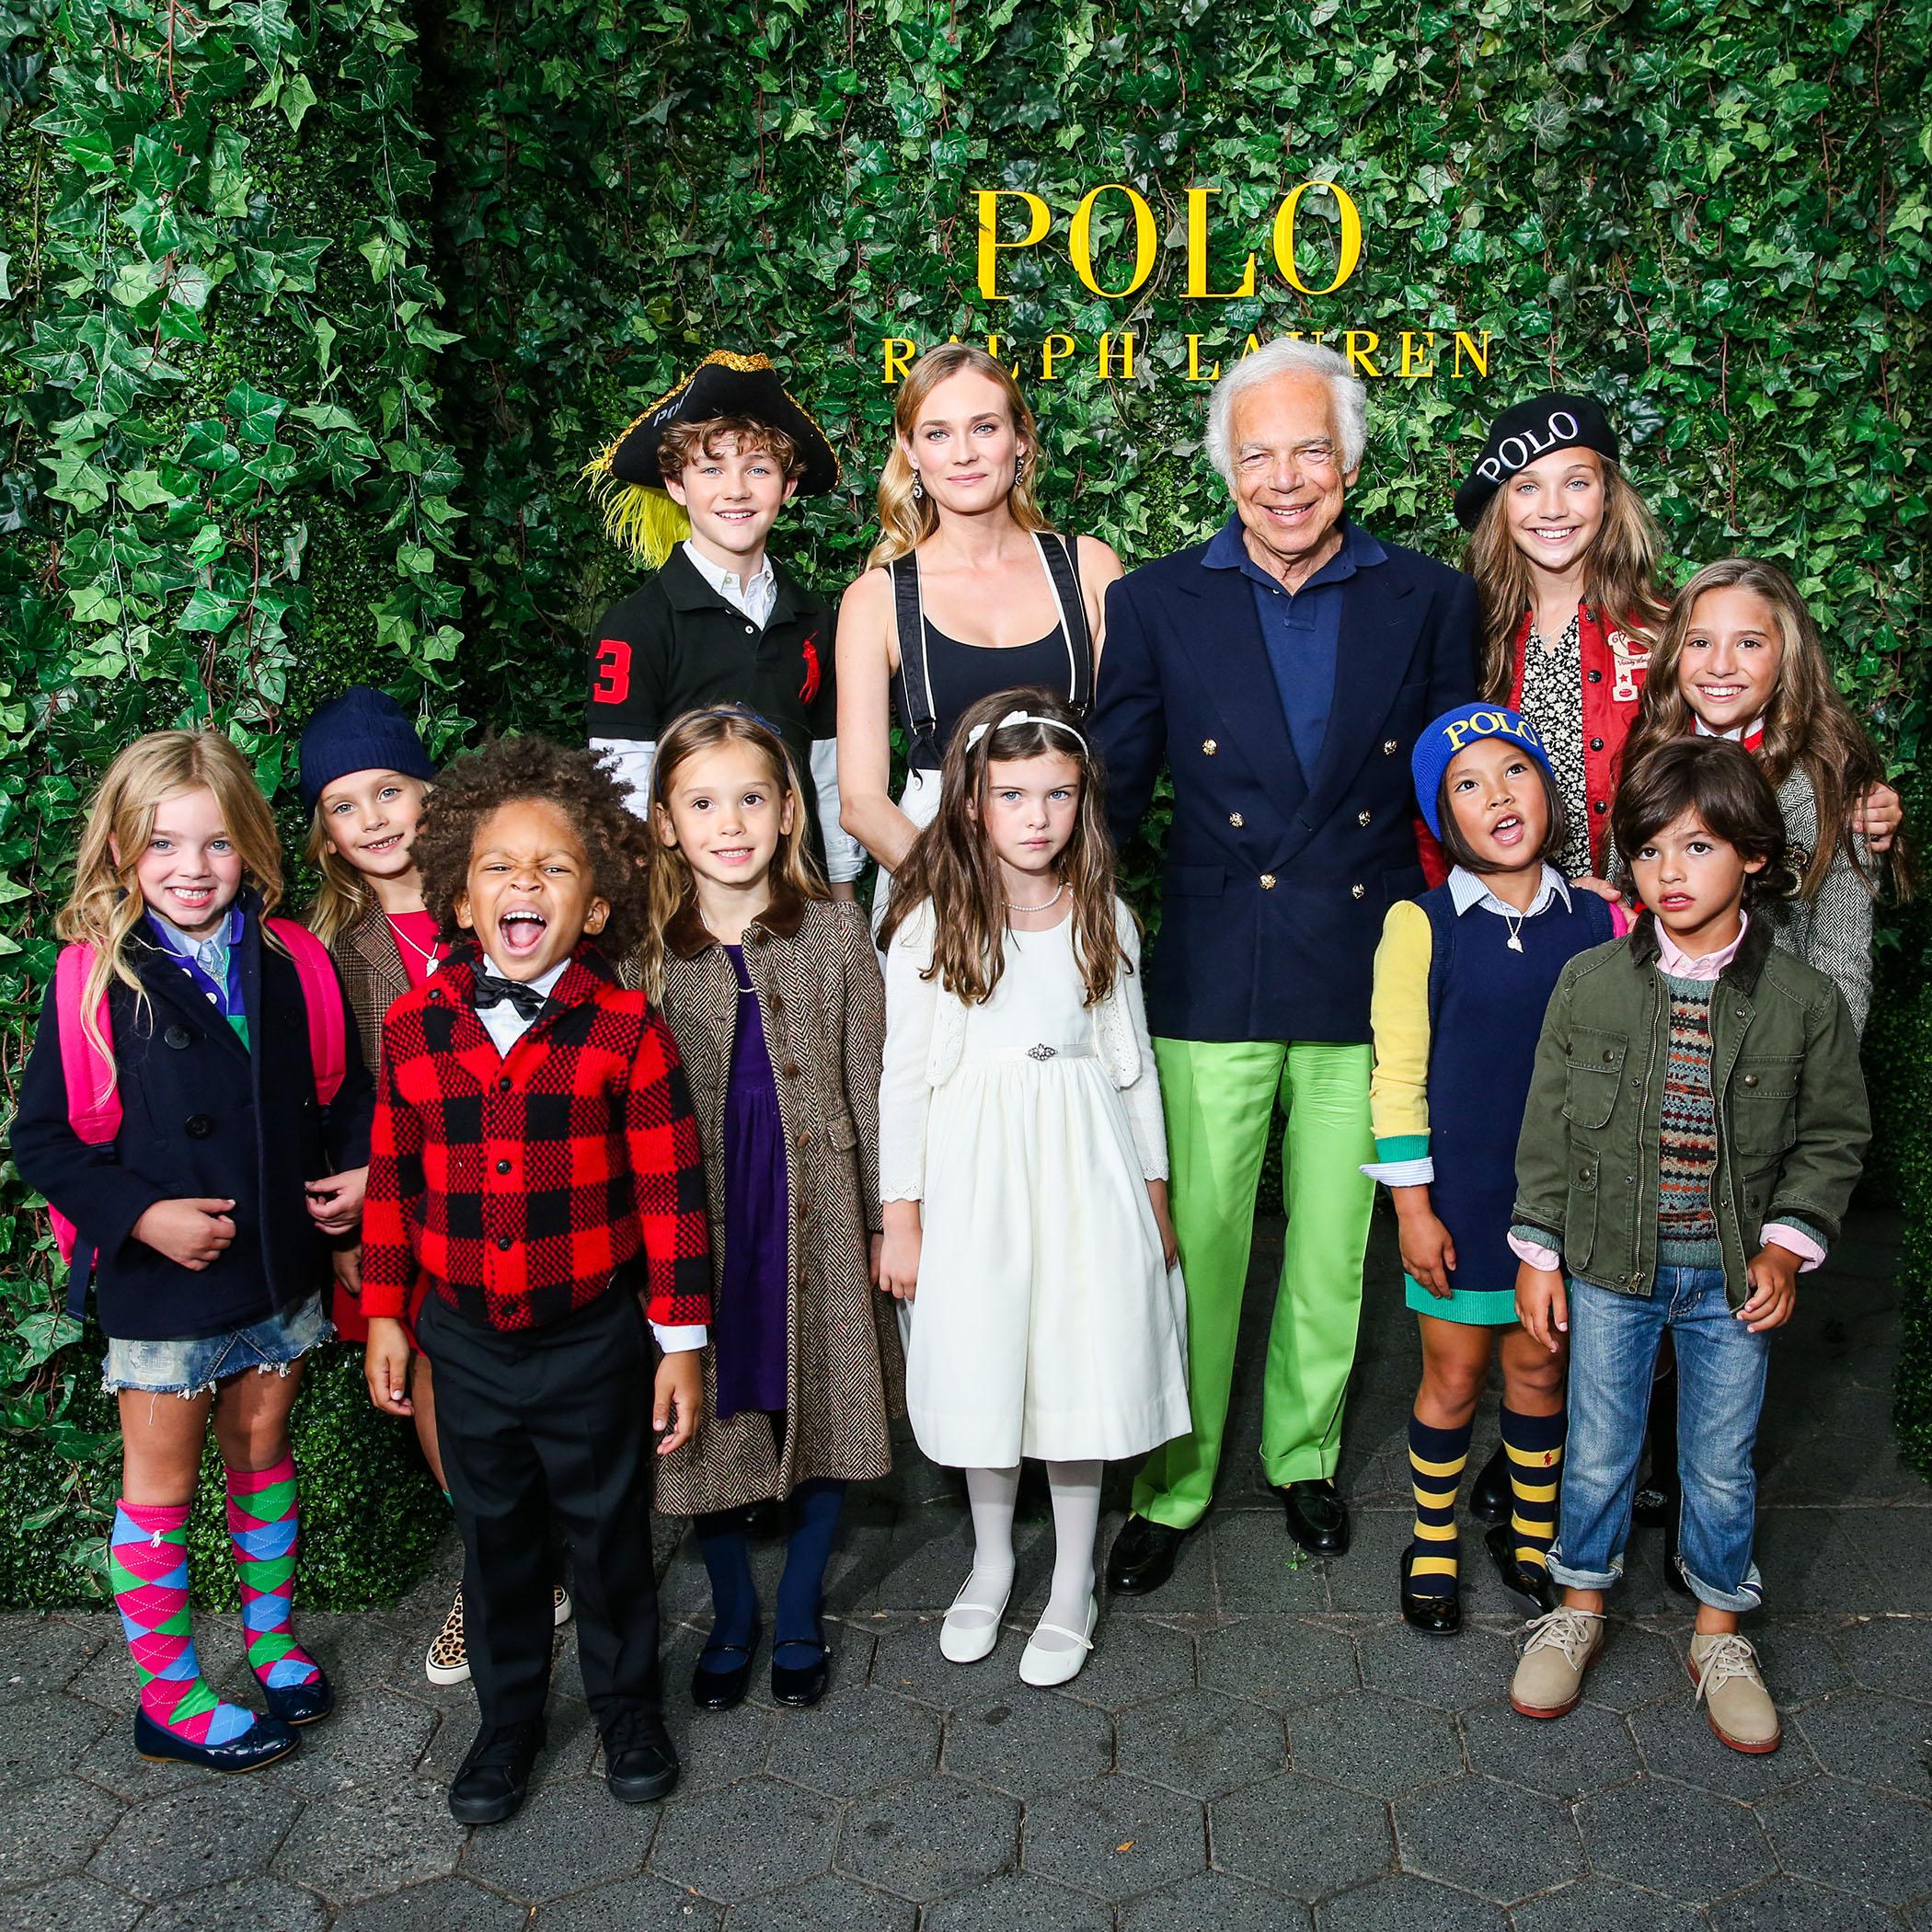 9facd6f4e POLO RALPH LAUREN Children's Fashion Show